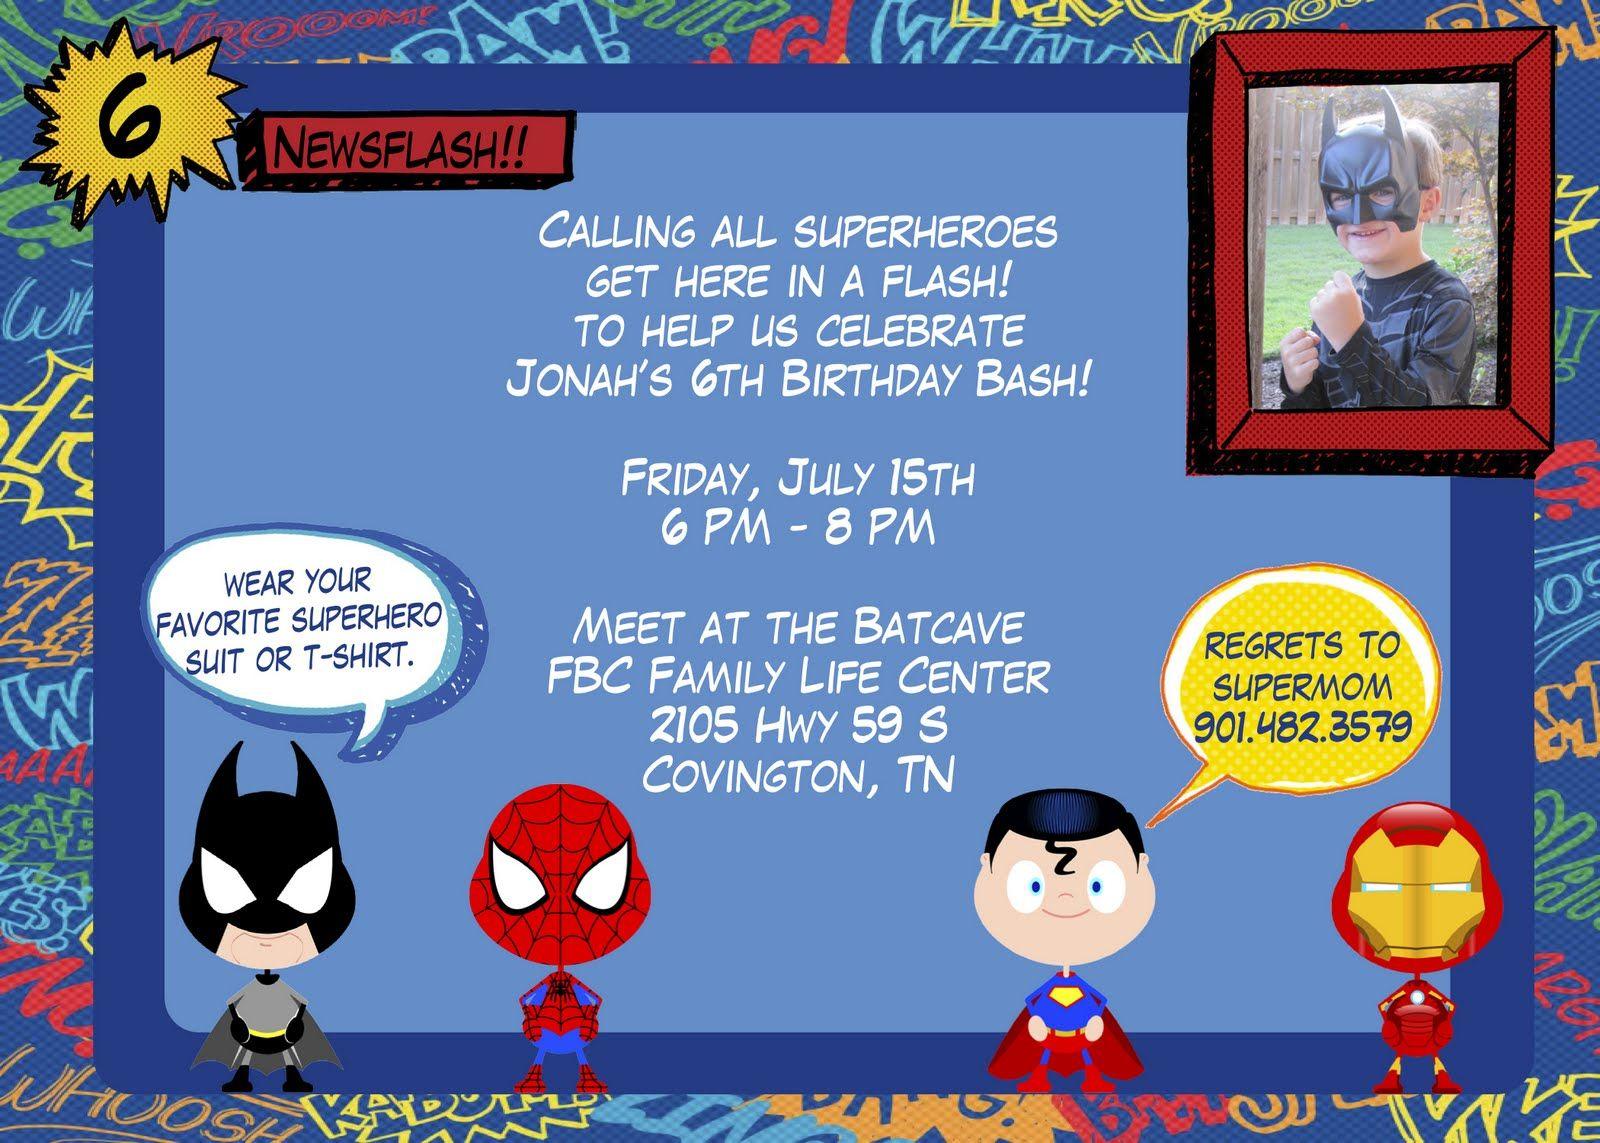 Superhero Birthday Party Invitations Templates Free – Superhero Birthday Invitations Free Printable